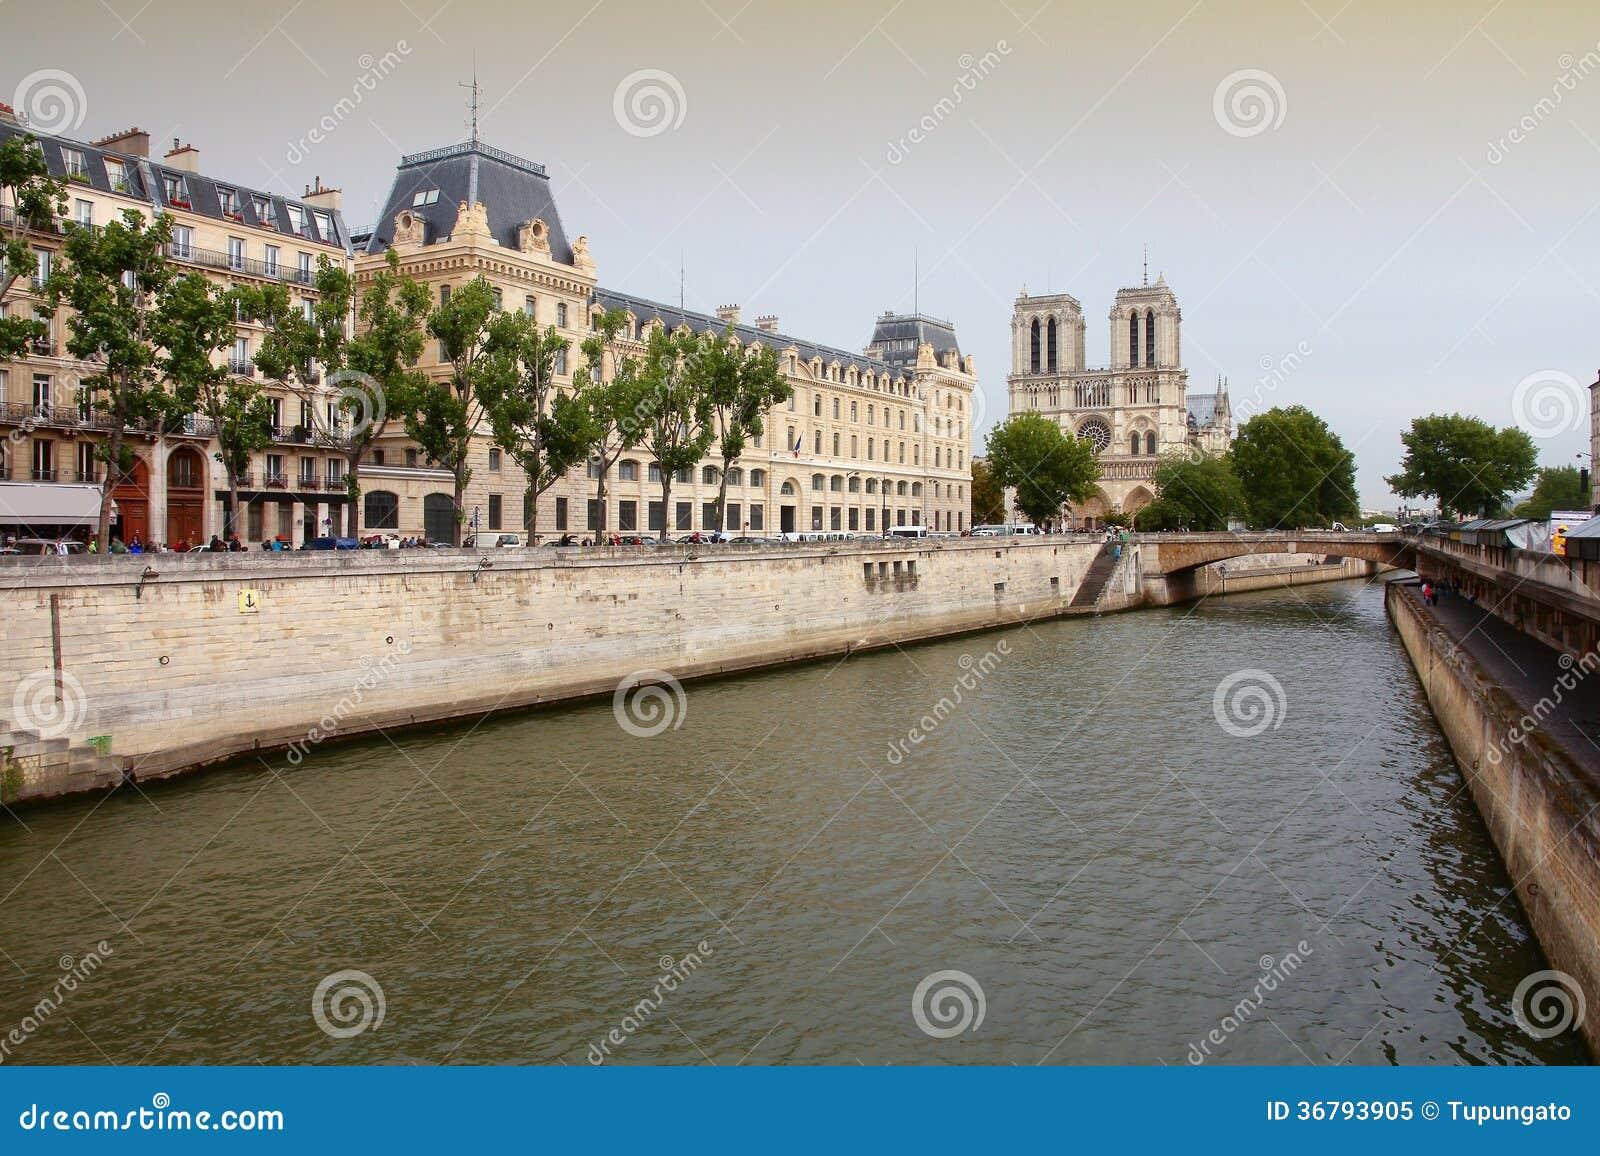 Best dating sites in paris france